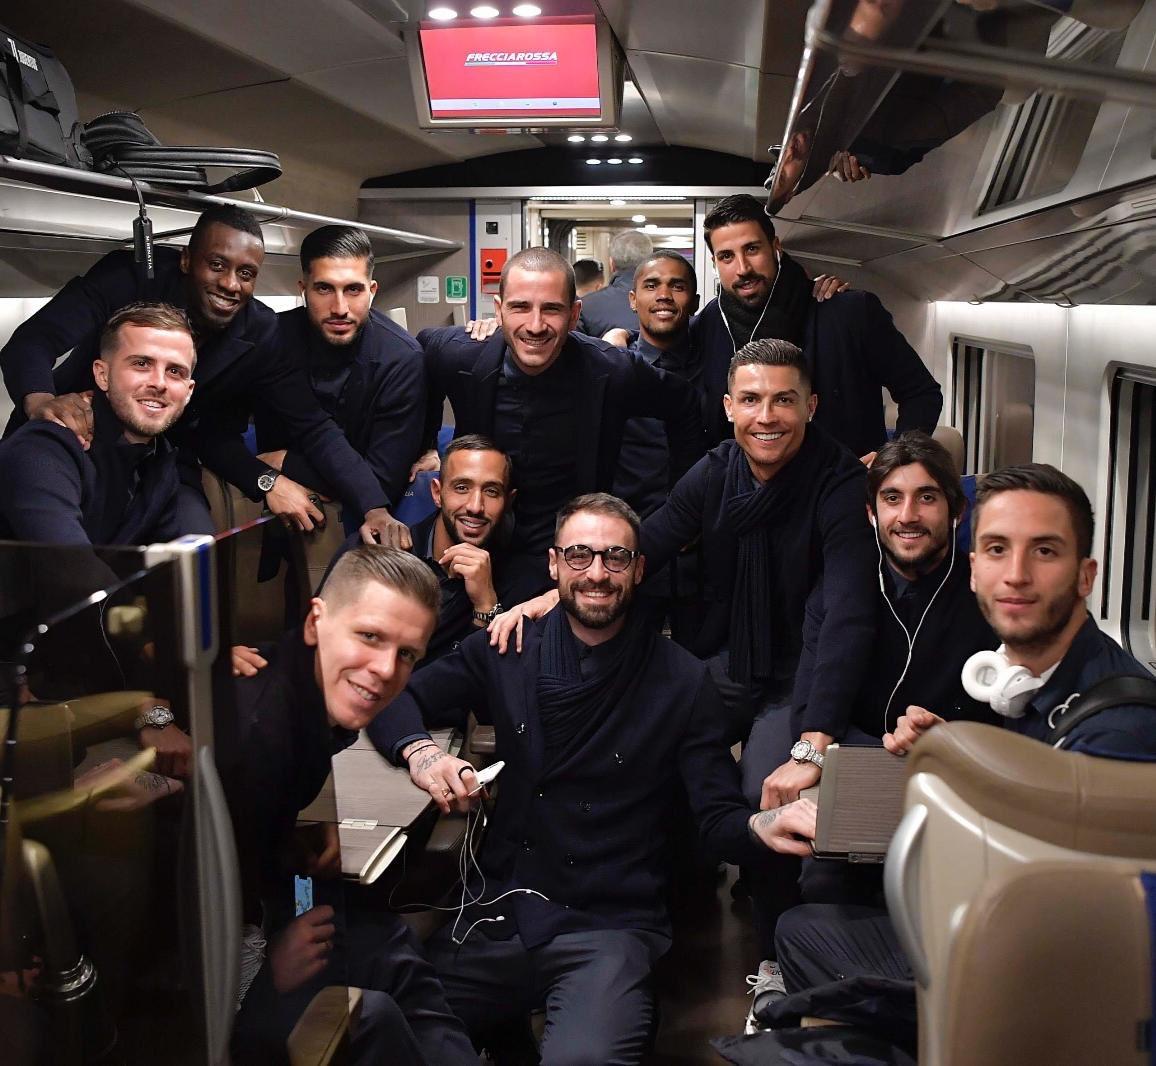 First stop in 2019: Bologna 😉🚅 #BolognaJuve #CoppaItalia @juventusfc